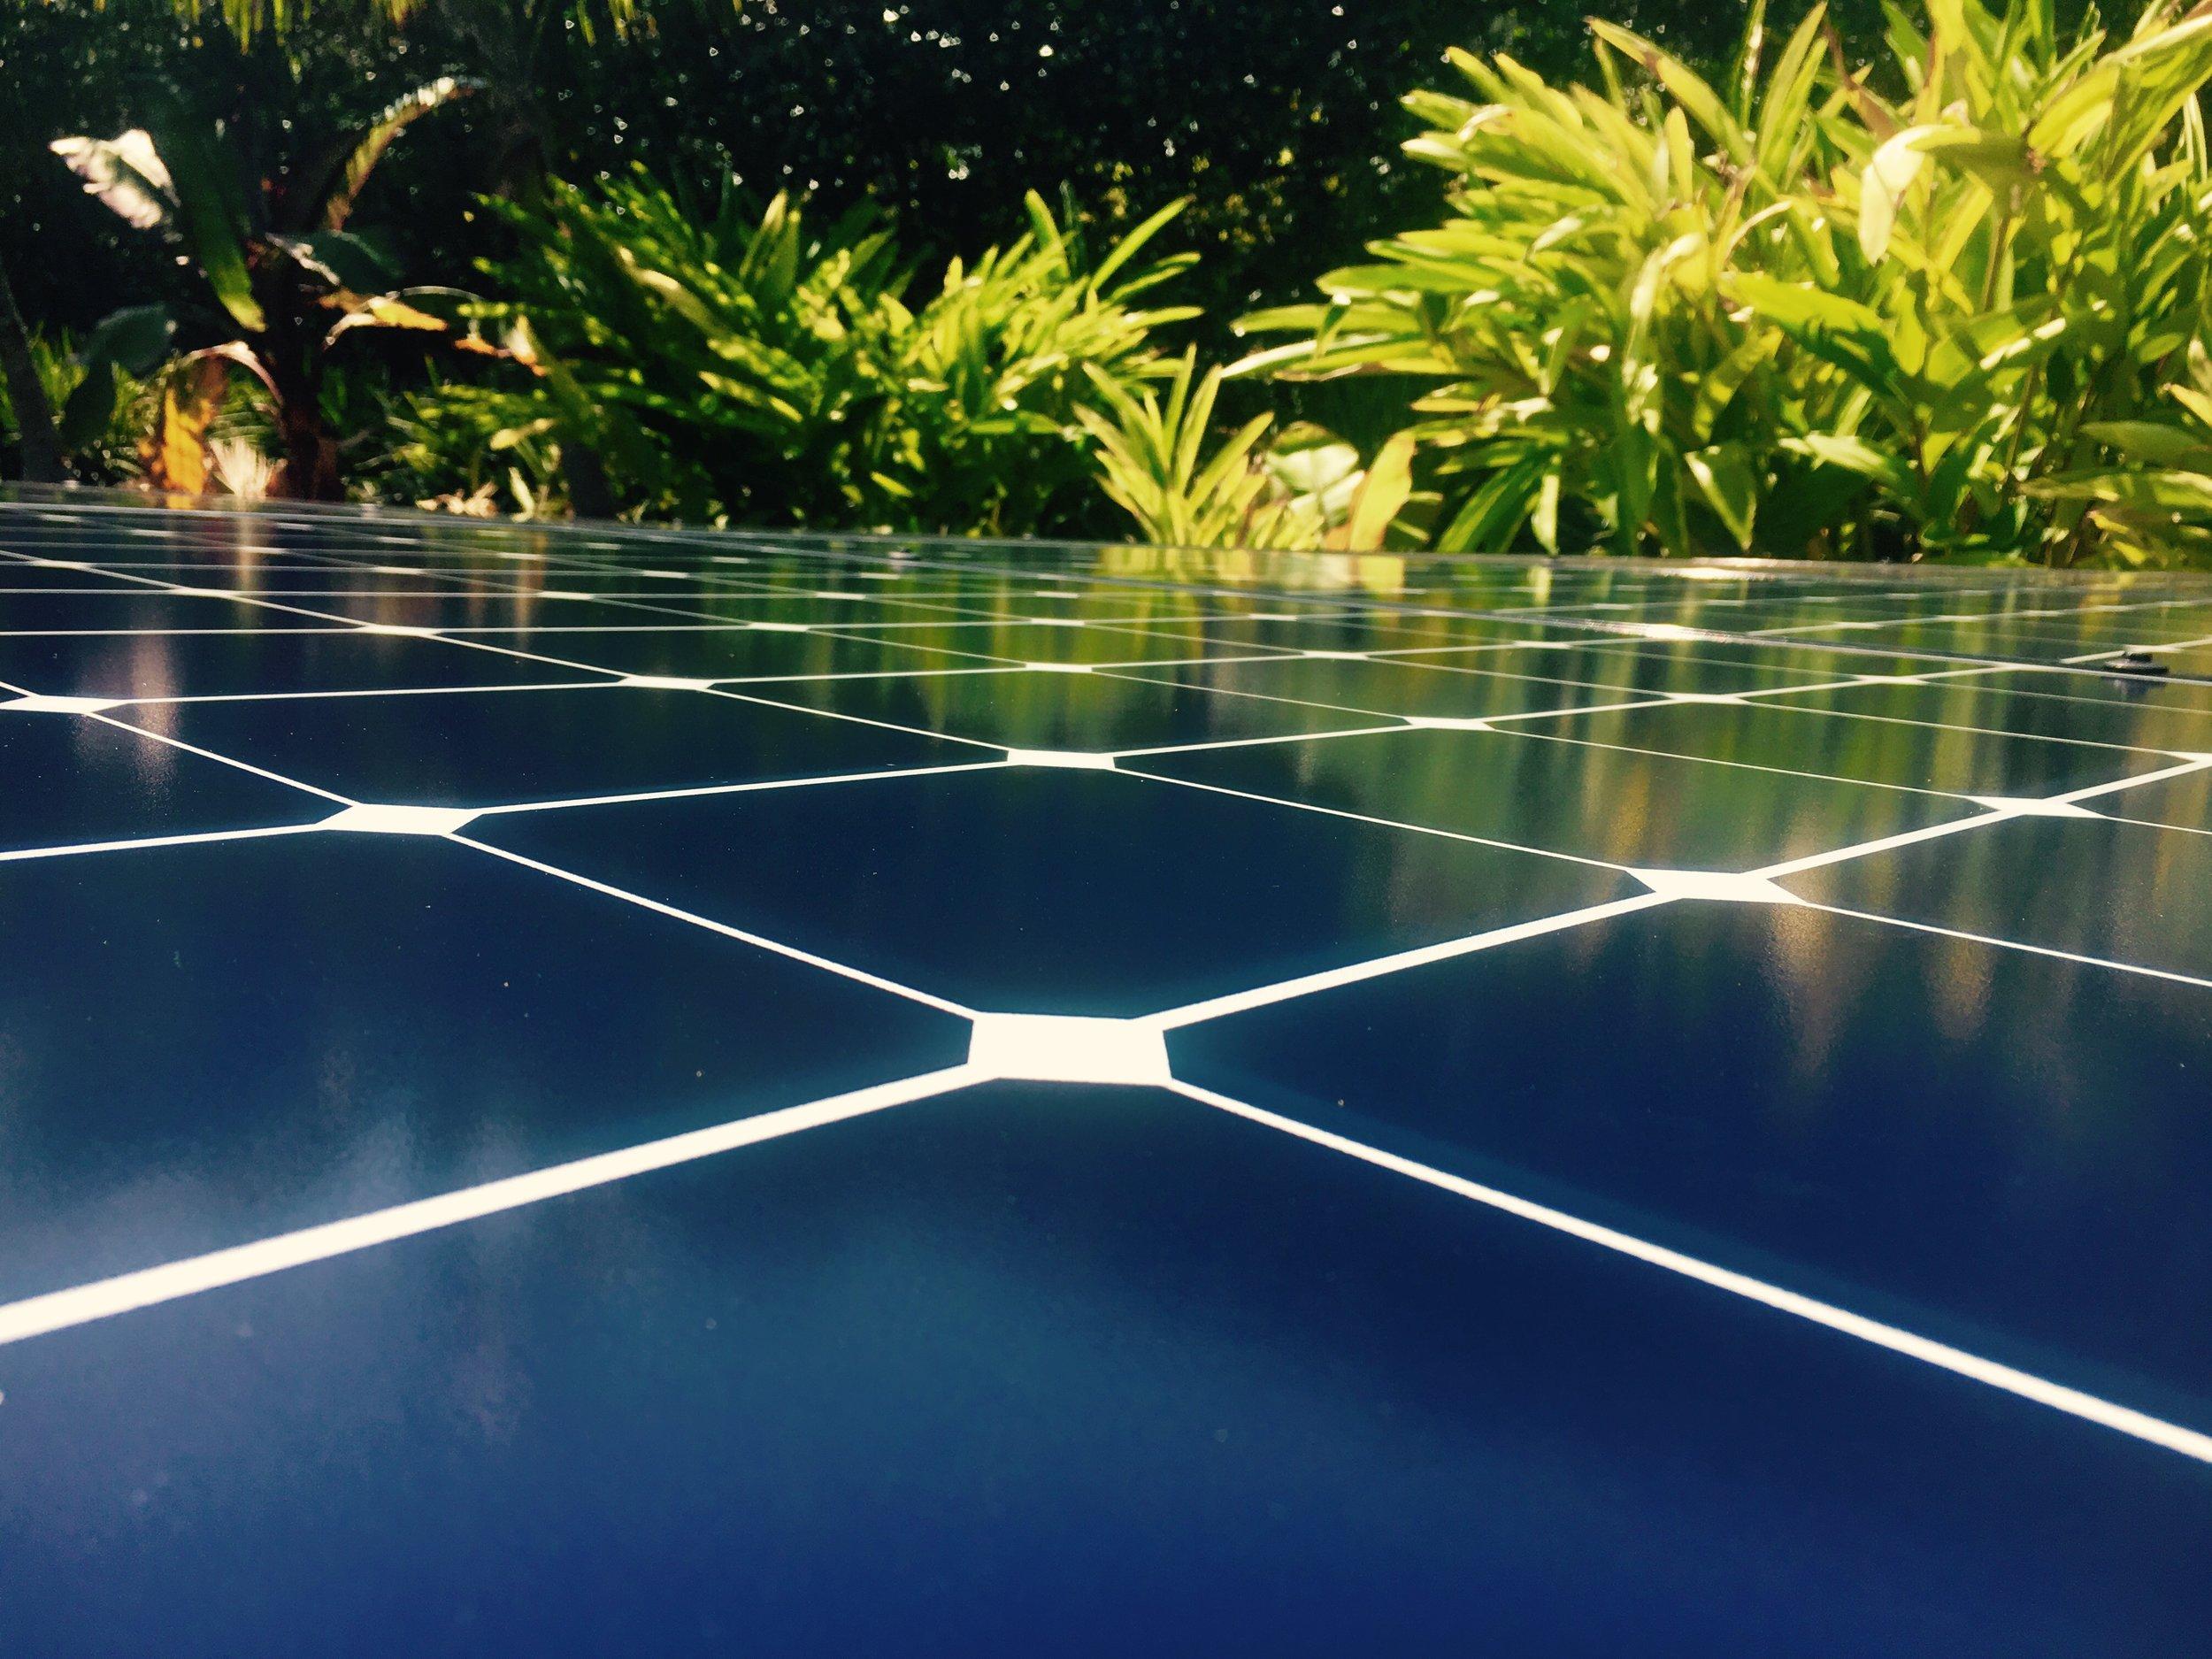 Brighten Solar Co. - Solar Energy Outreach and Education